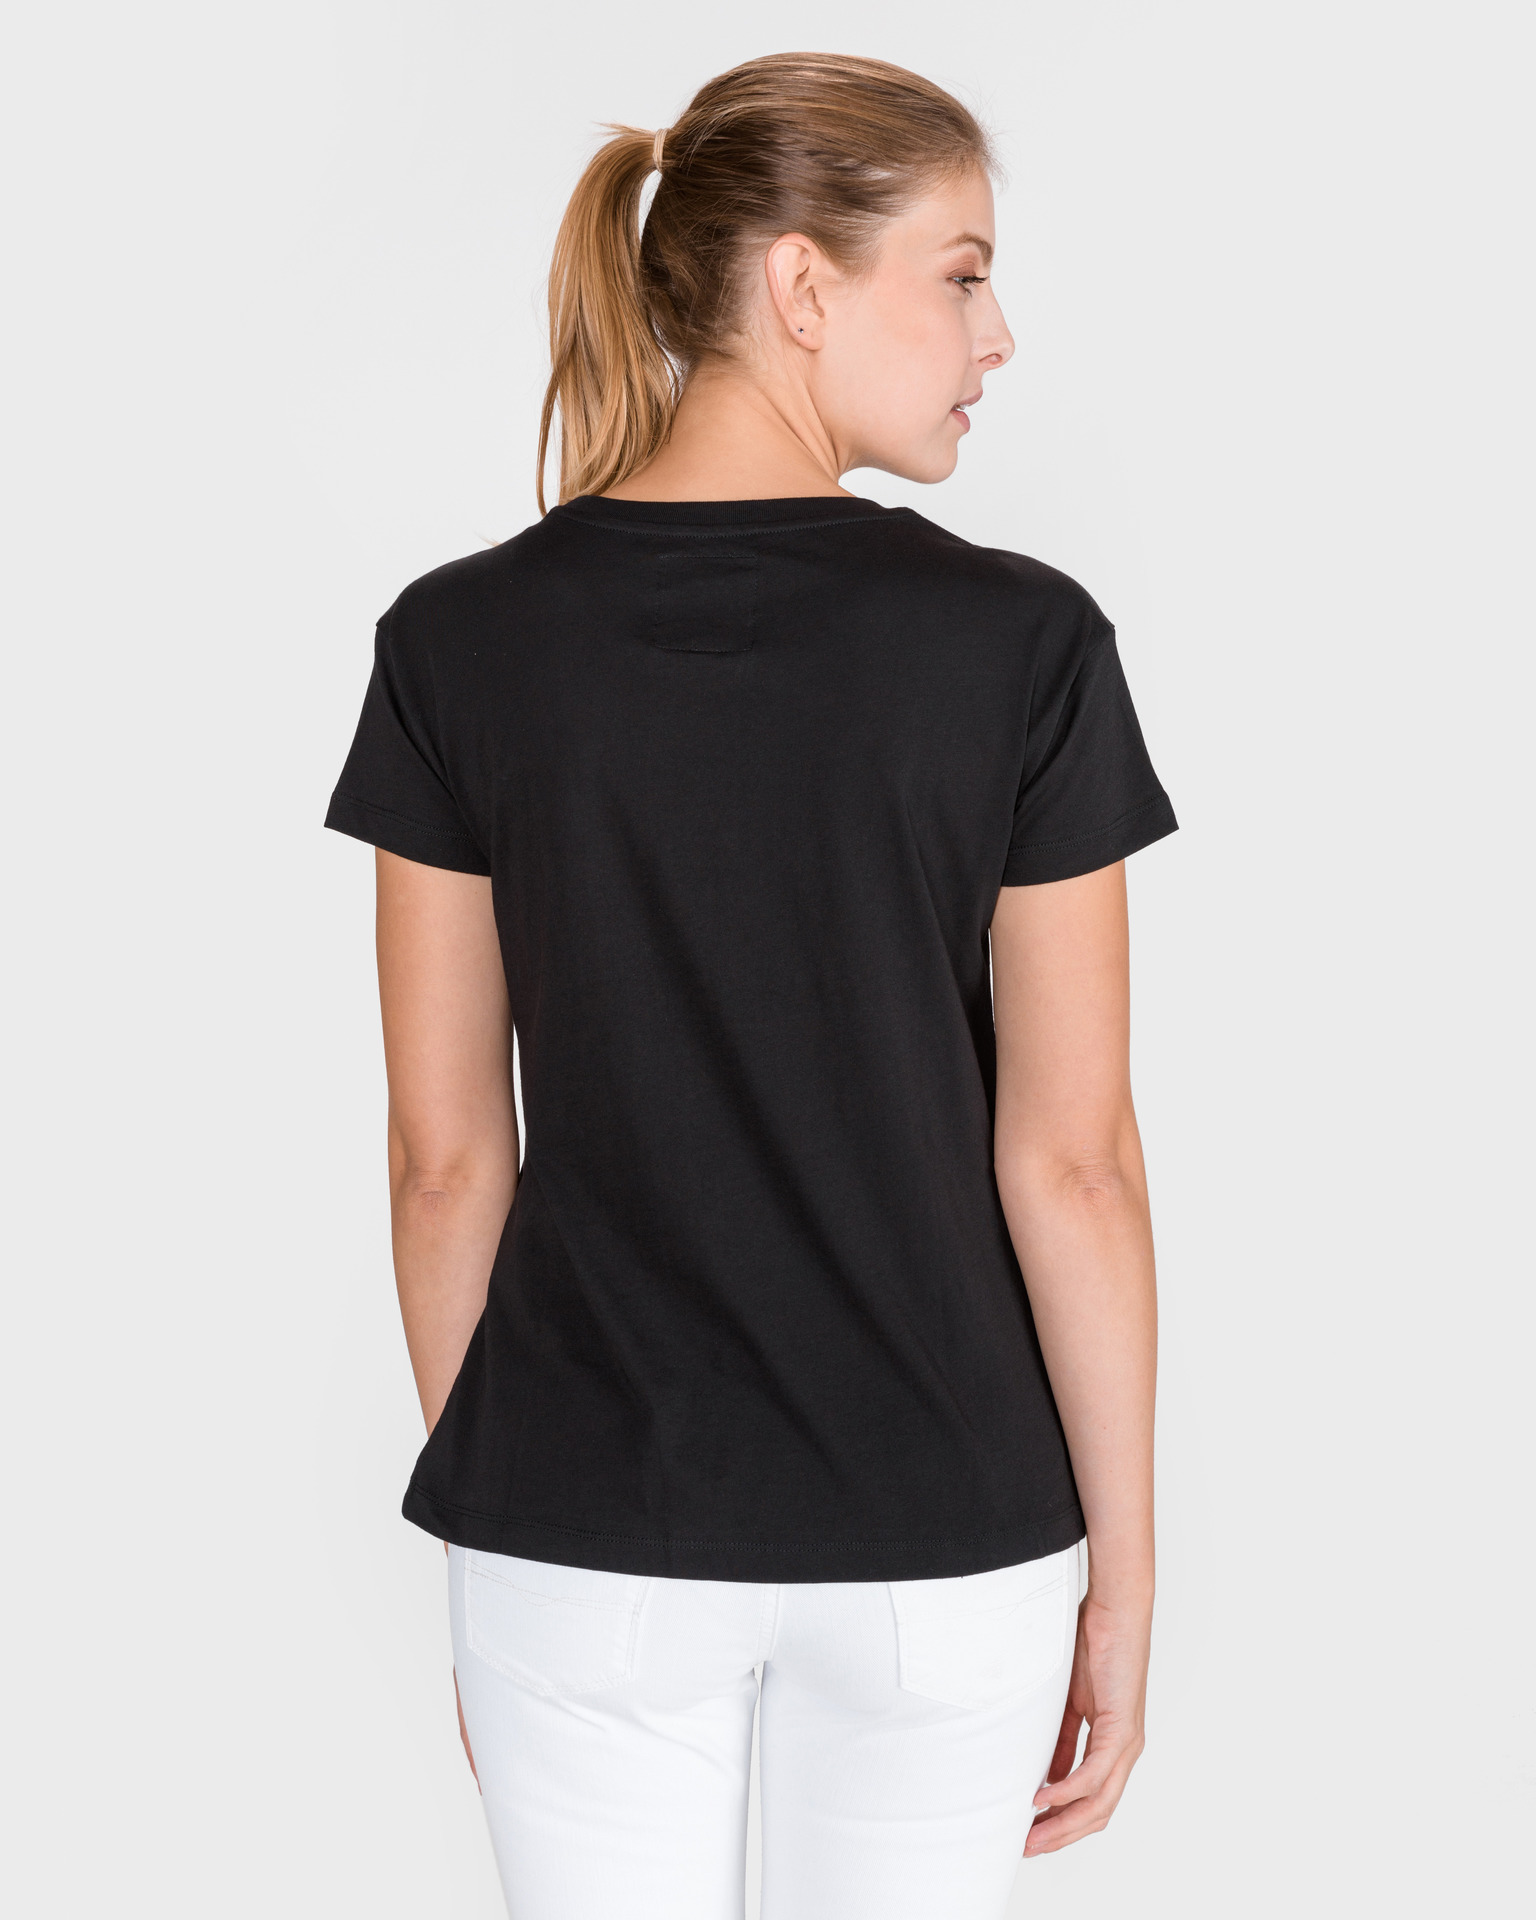 Armani Exchange czarny damska koszulka